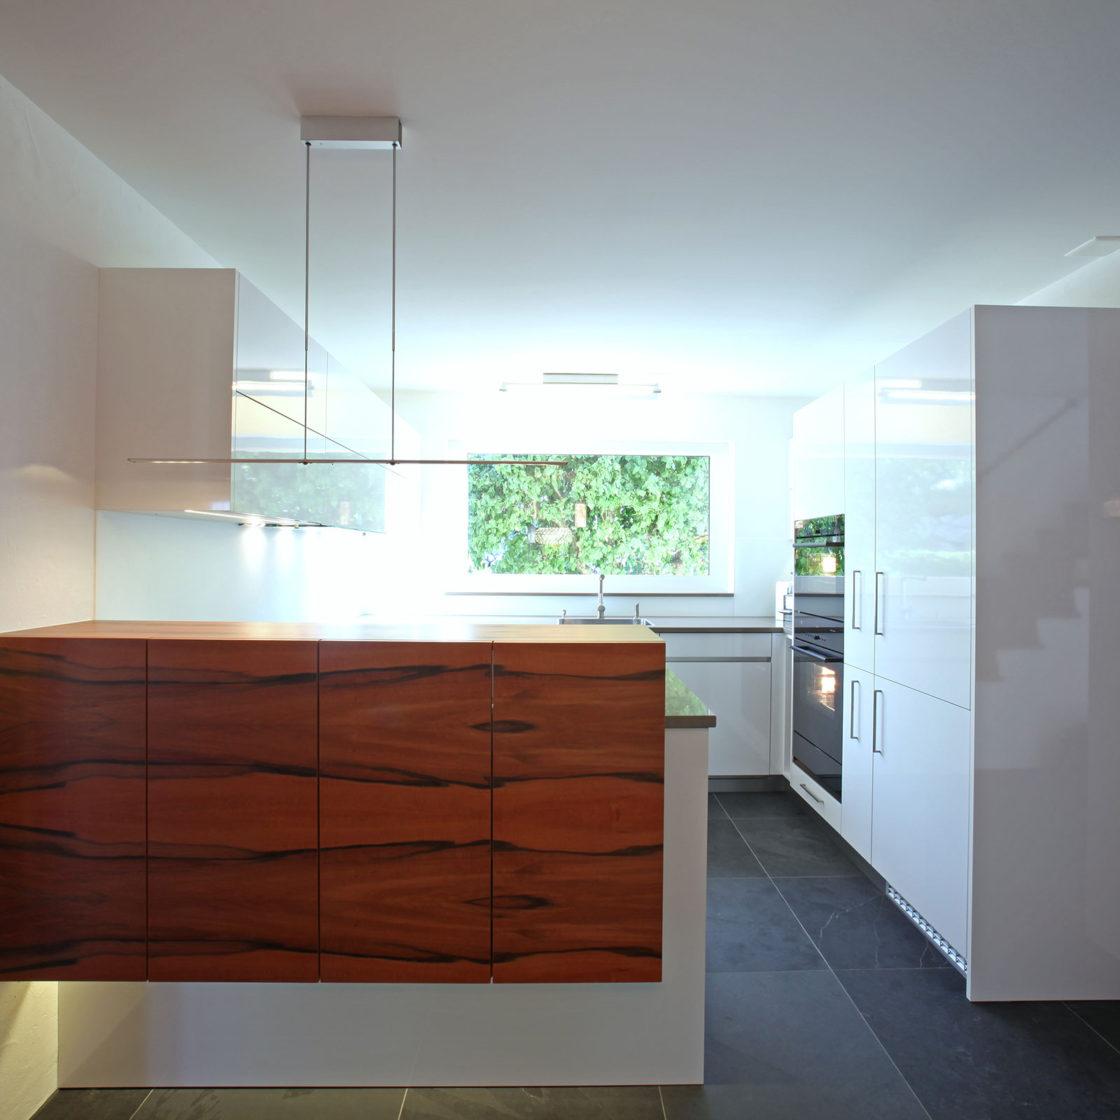 Küche_FriedliAusbau_Ref12_3